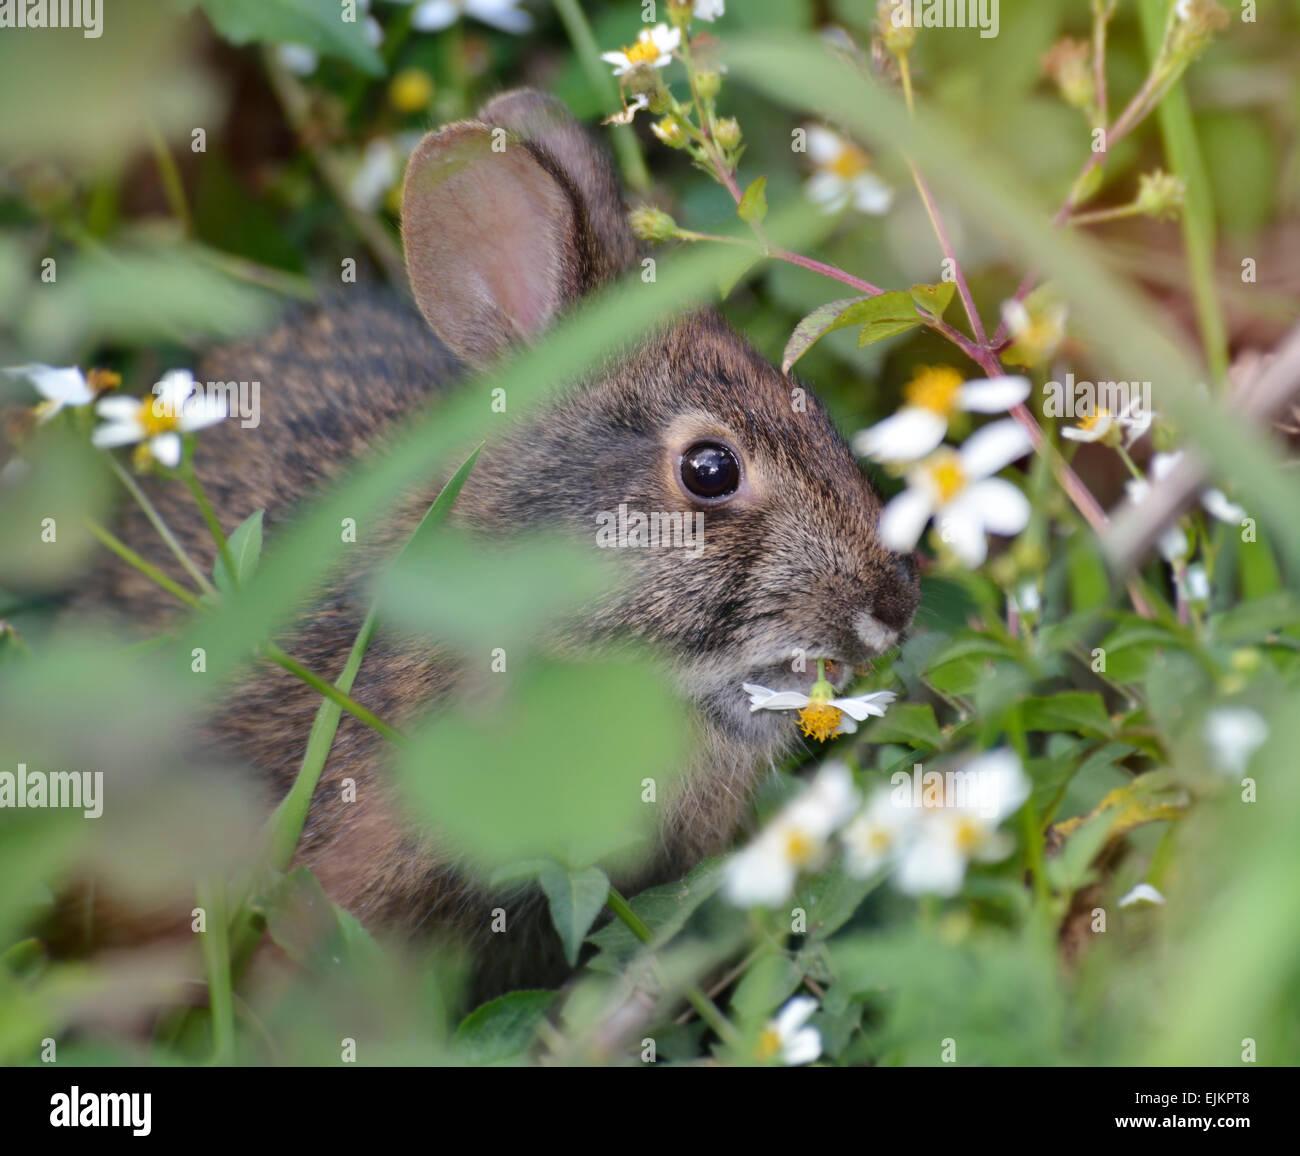 Wild Rabbit Eating A Flower - Stock Image